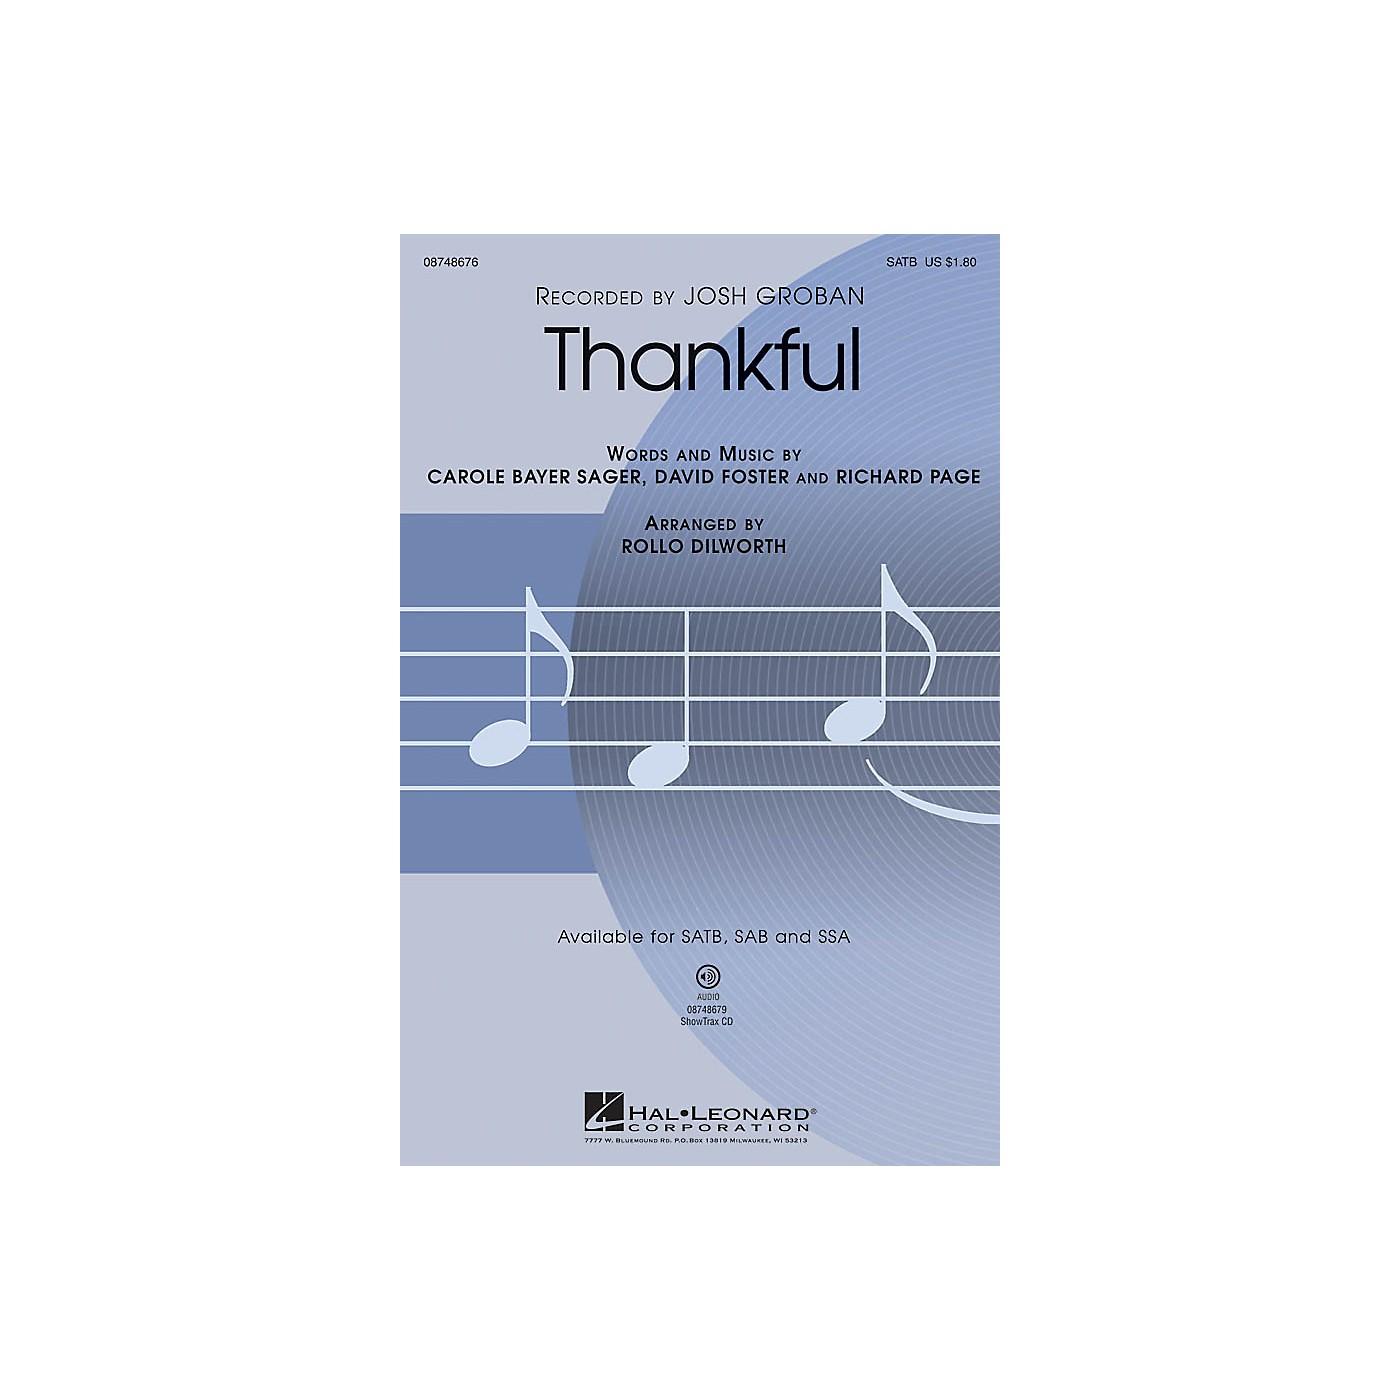 Hal Leonard Thankful ShowTrax CD Arranged by Rollo Dilworth thumbnail